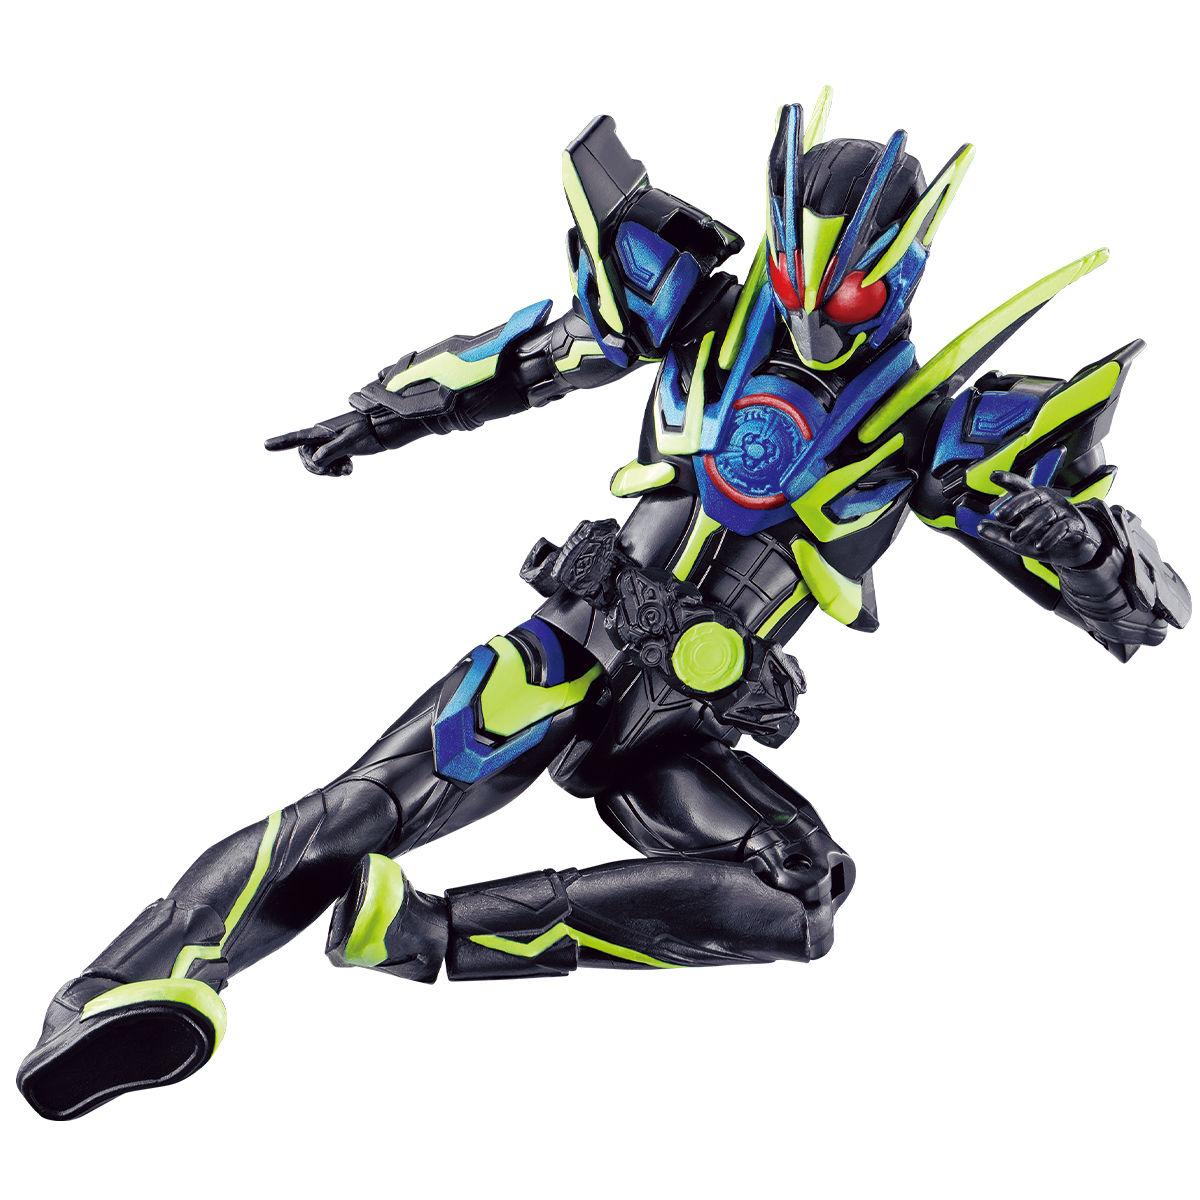 RKF『仮面ライダーゼロワン シャイニングアサルトホッパー』可動フィギュア-003